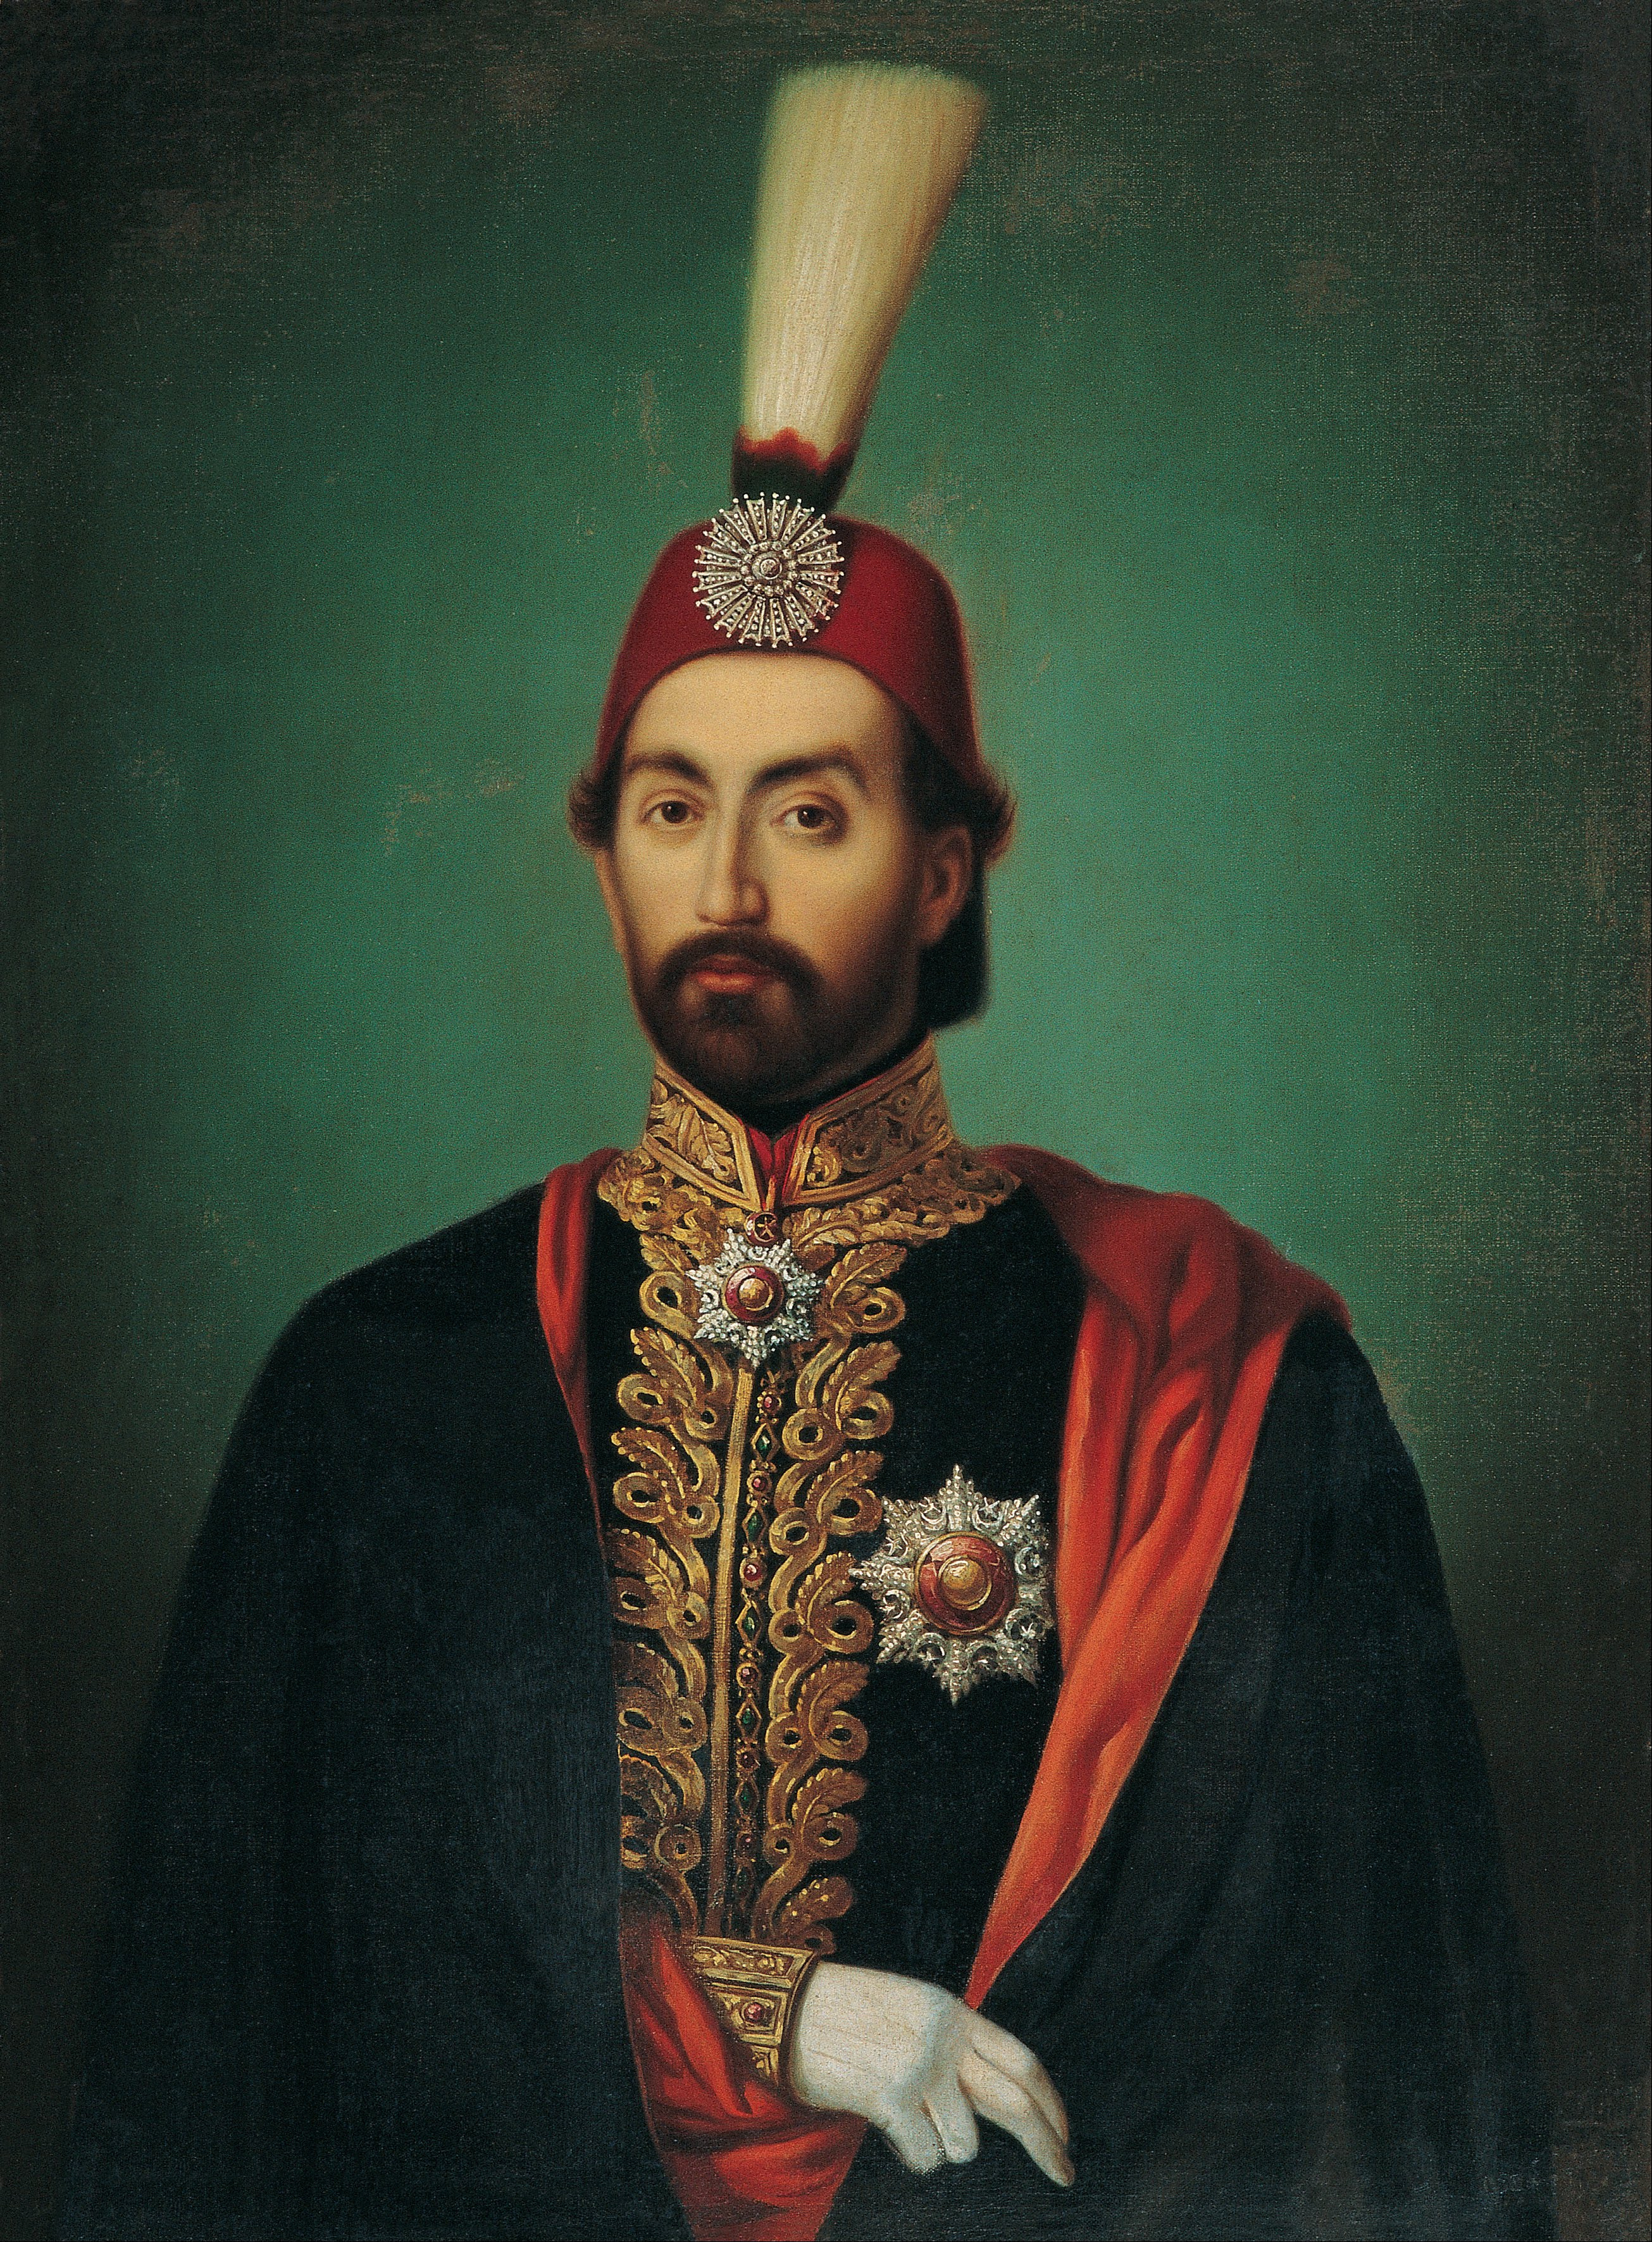 Empire Ottoman/دولتِ عَليه عُثمانيه  Sultan_Abdülmecid_-_Google_Art_Project